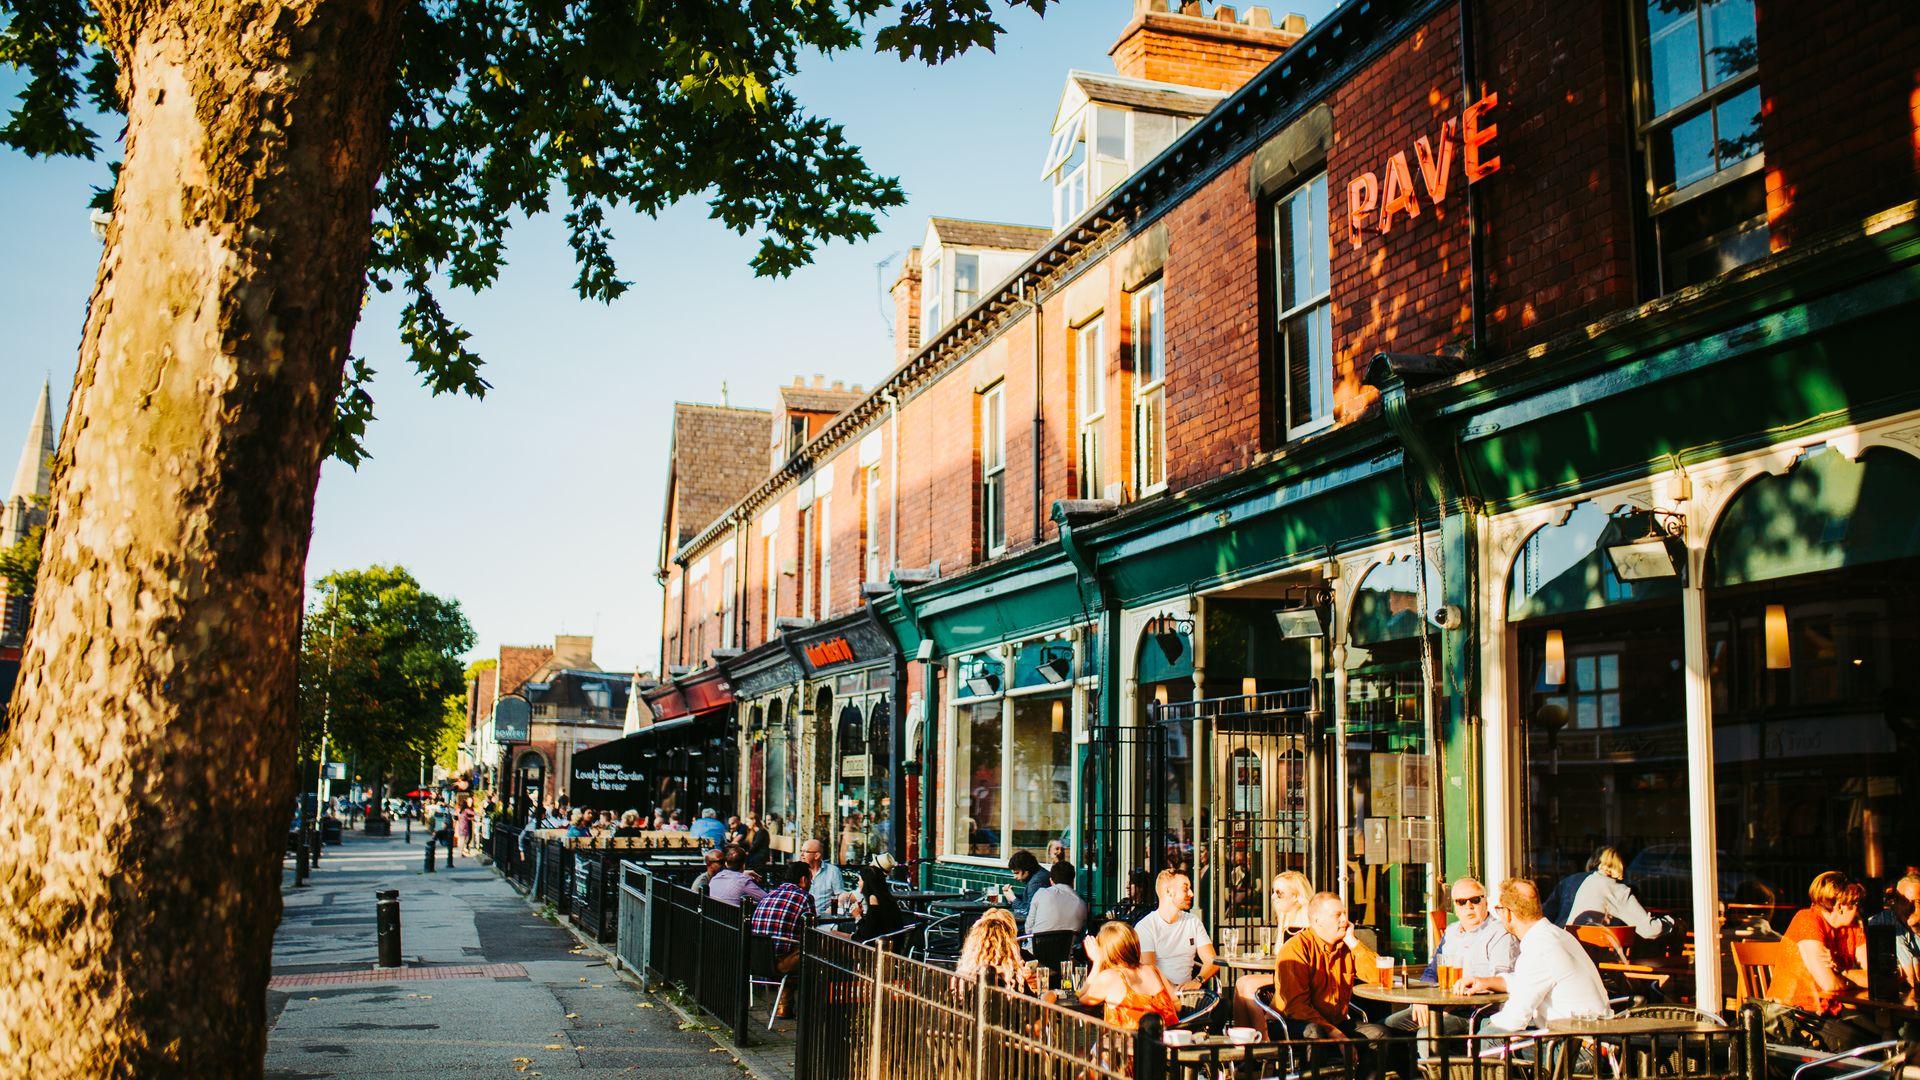 Hull Pave Restaurant on Princes Avenue